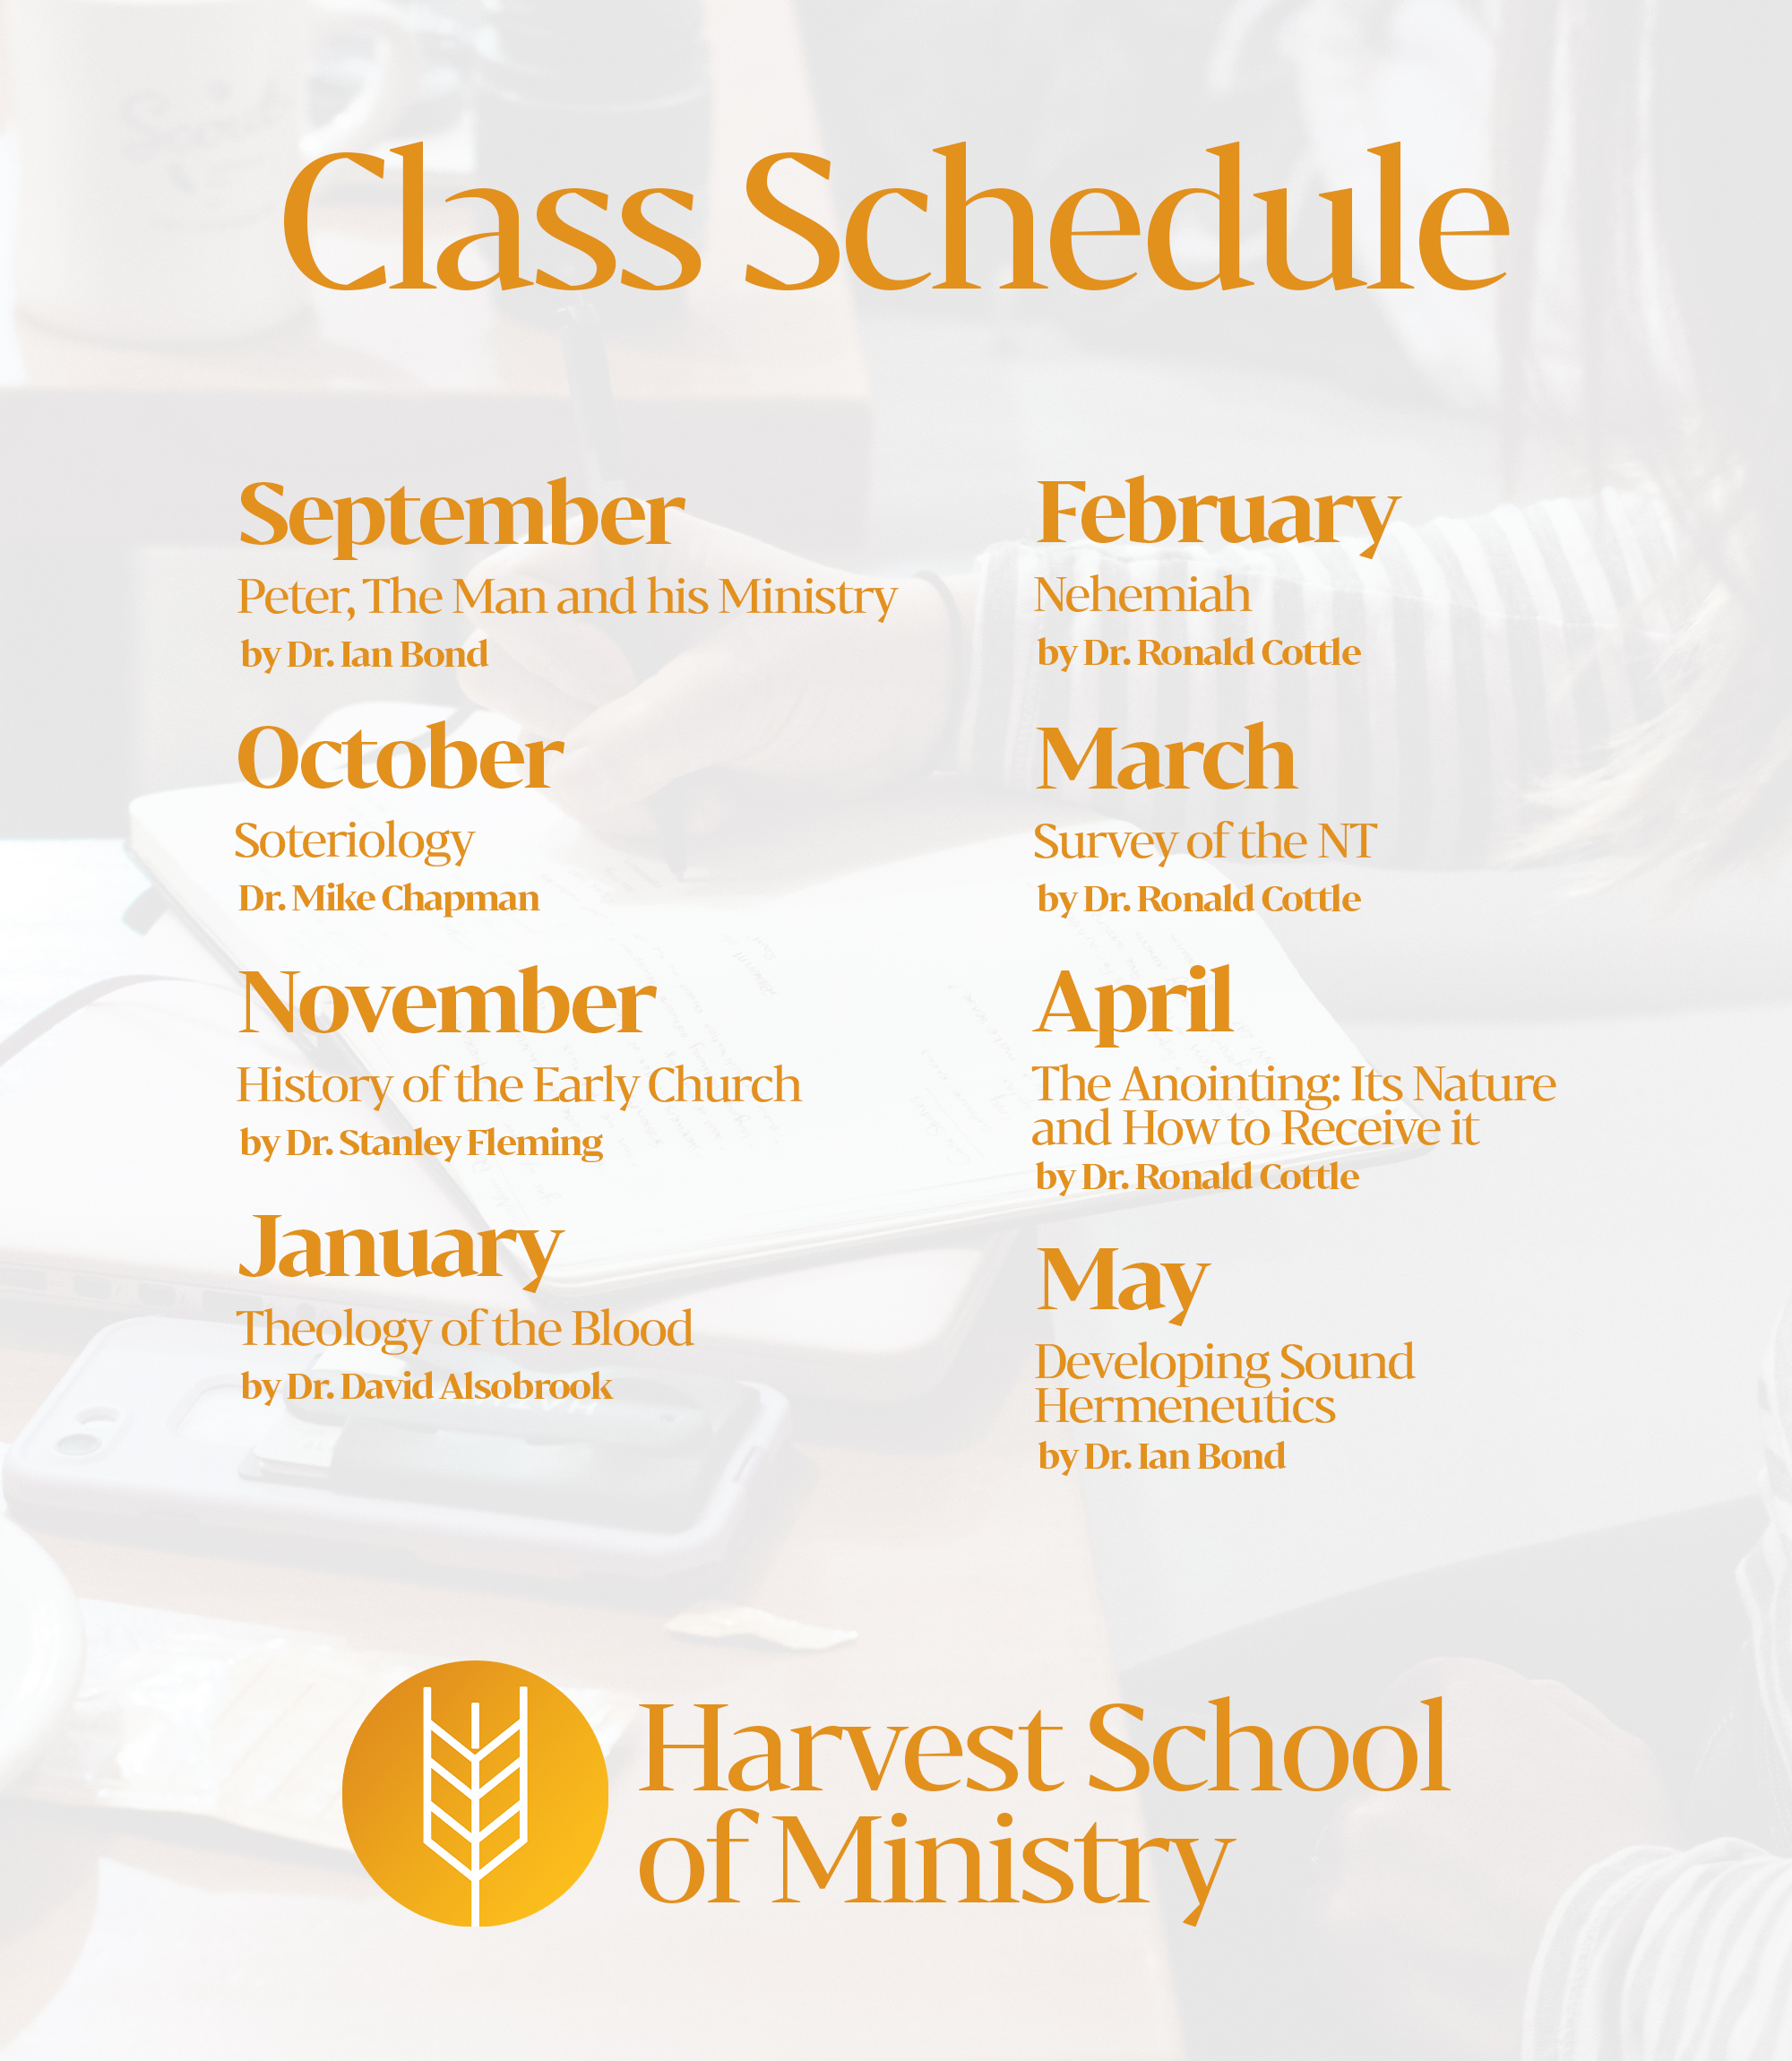 2019-2020 Class Schedule.jpg